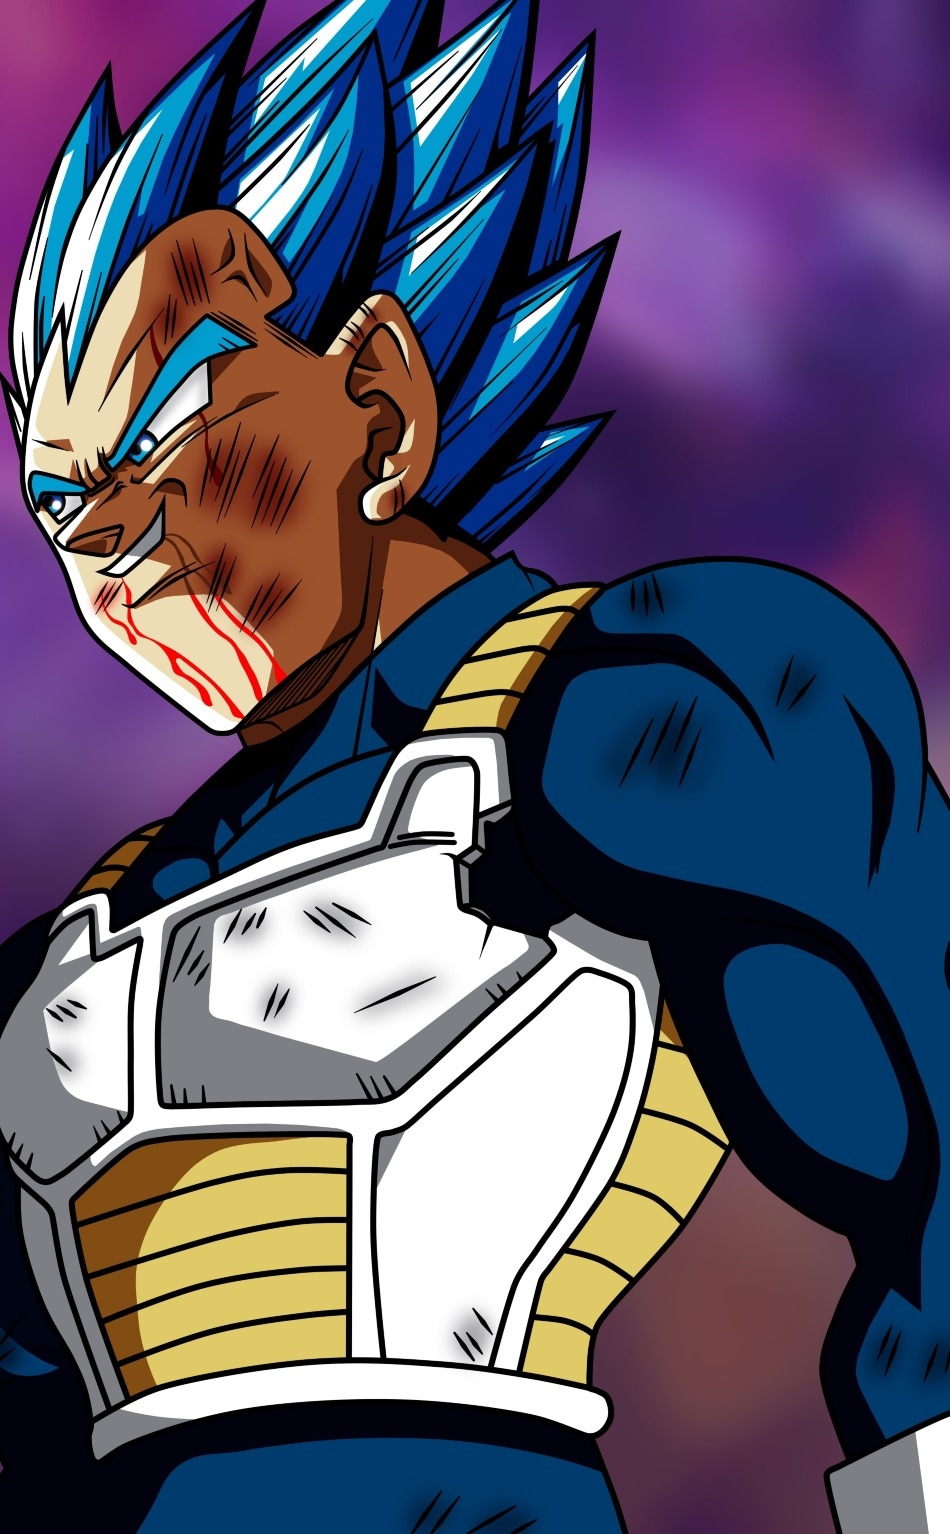 Vegeta Dragon Ball Goku  Hd 8k Wallpaper